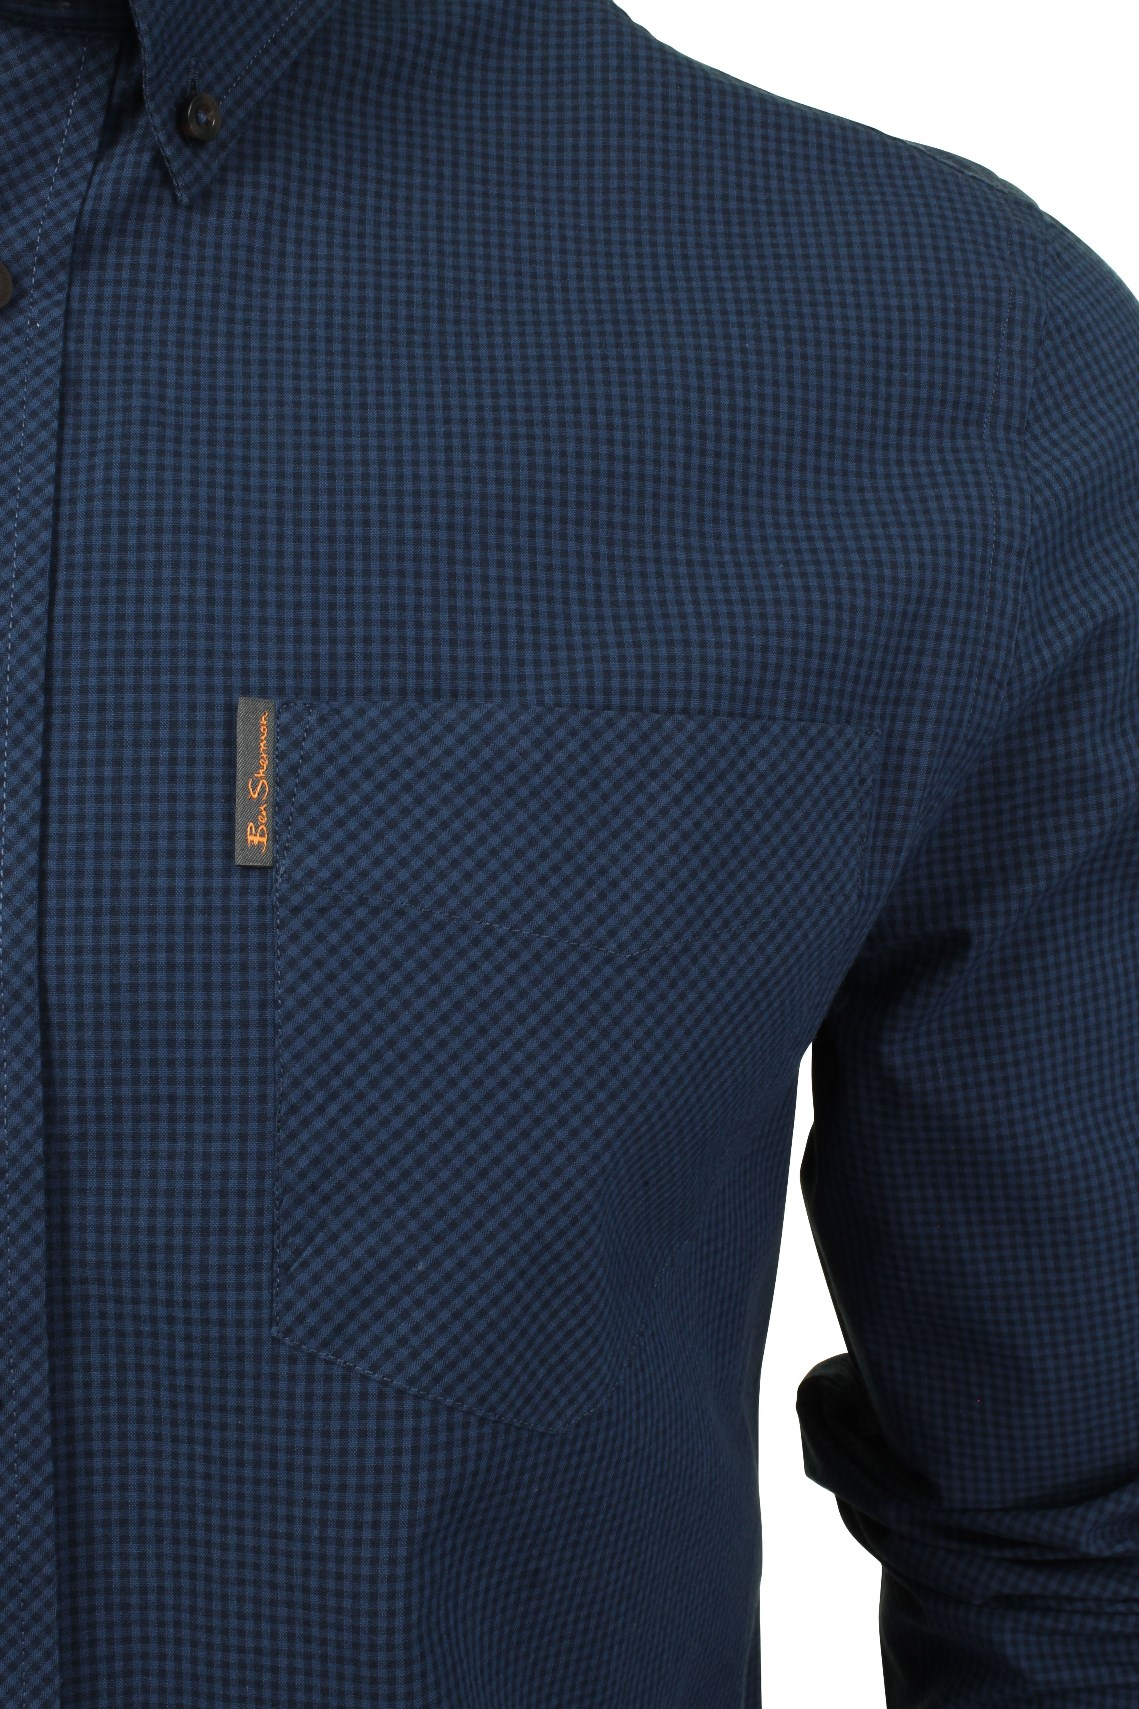 Mens-Classic-Gingham-Shirt-by-Ben-Sherman-Long-Sleeved thumbnail 7